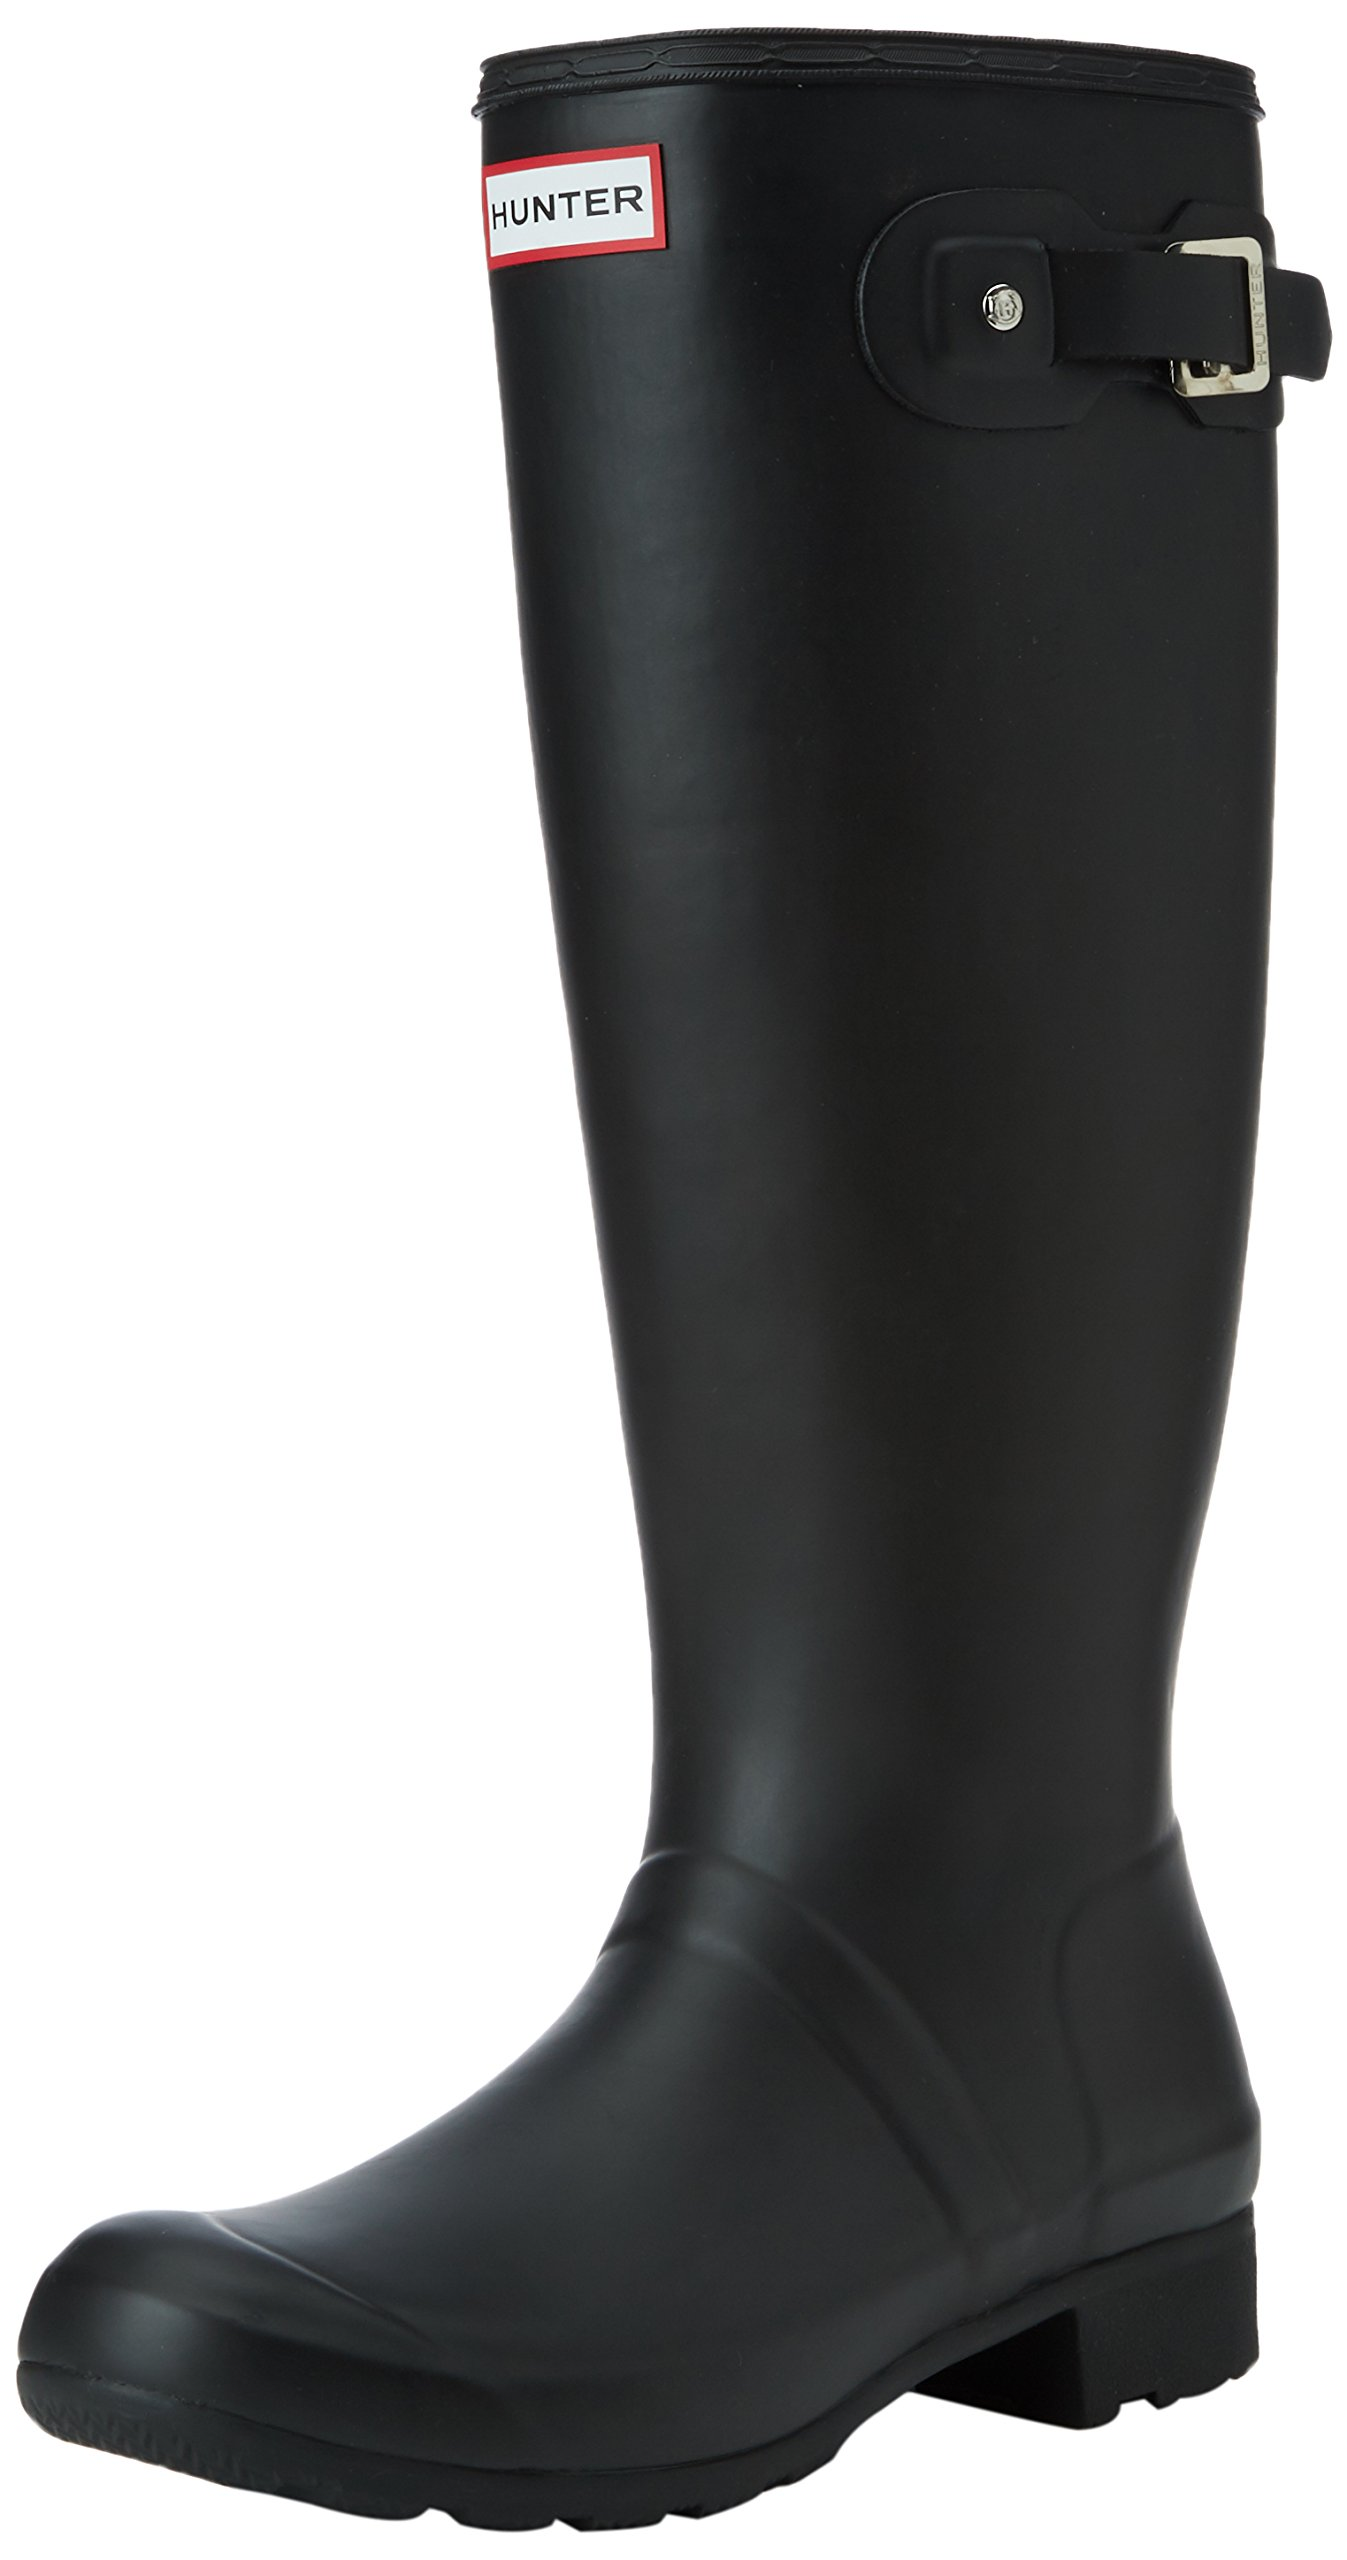 Womens Hunter Original Tour Rain Winter Snow Festival Wellington Boots - Black - 5